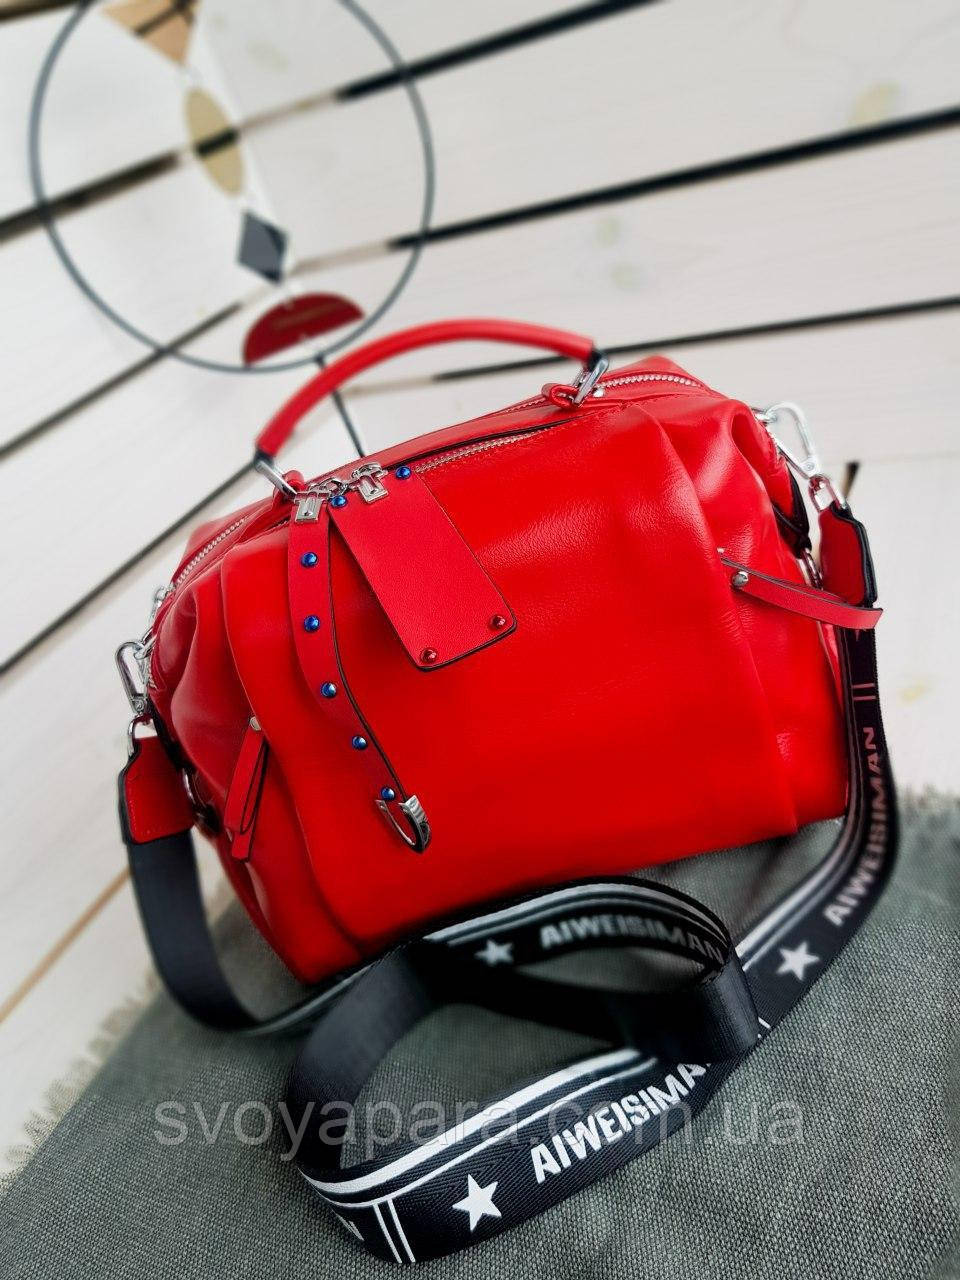 Женская кожаная сумка размером 26х20х13 см Красная (01229)